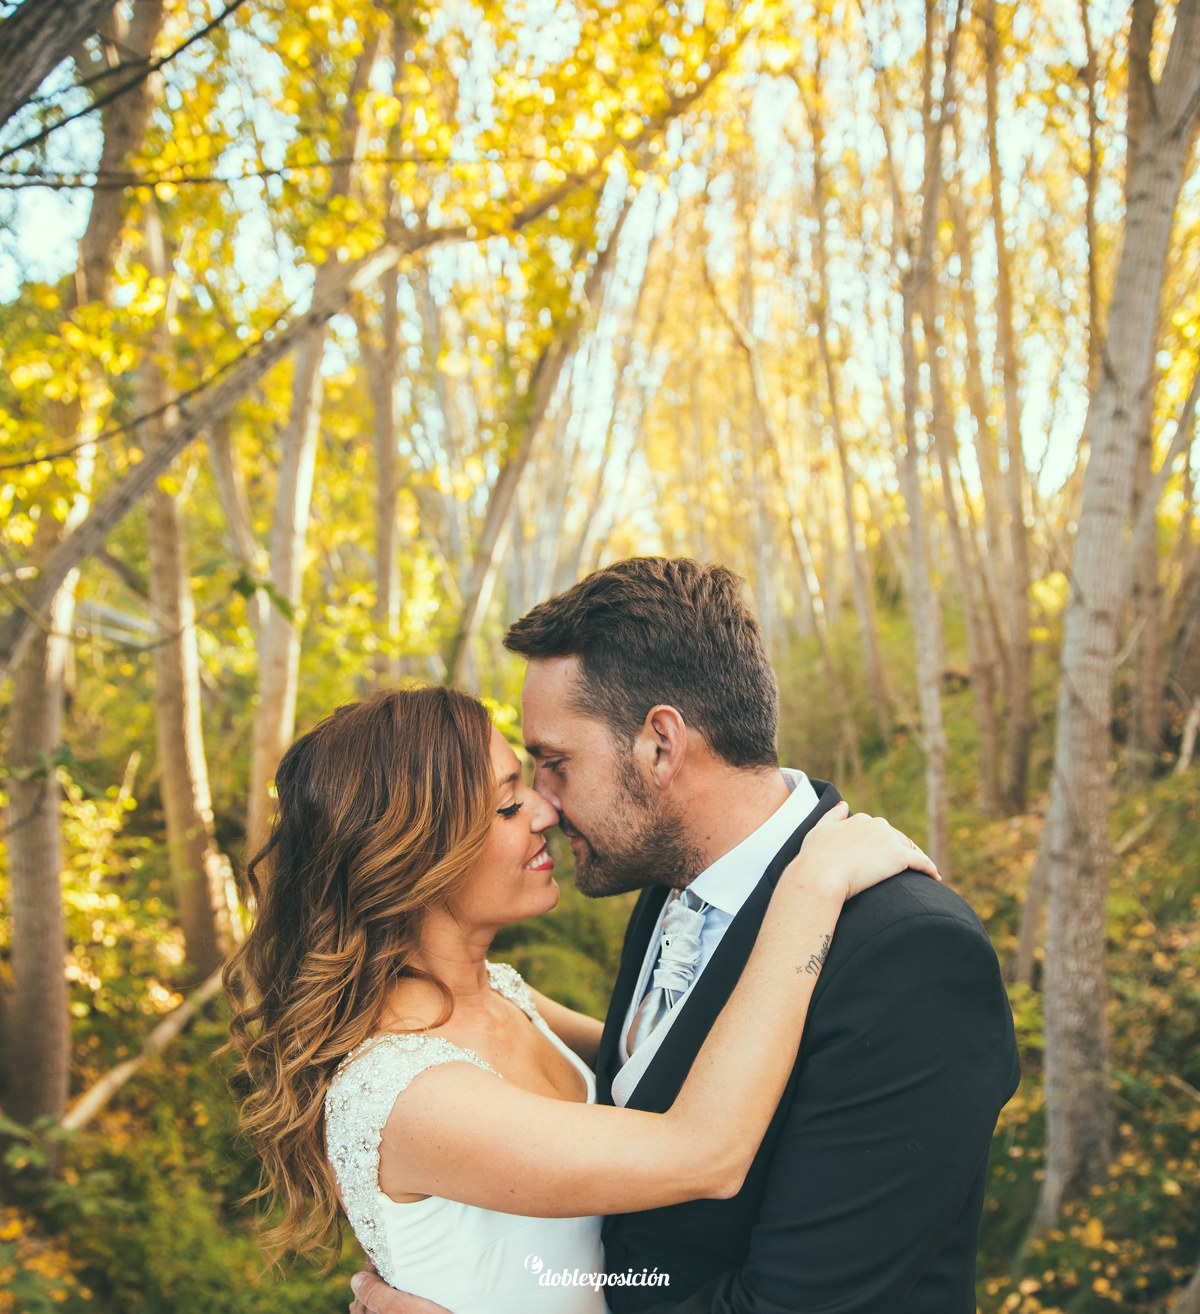 fotografos-boda-elche-alicante-reportaje-bosque-postboda-007